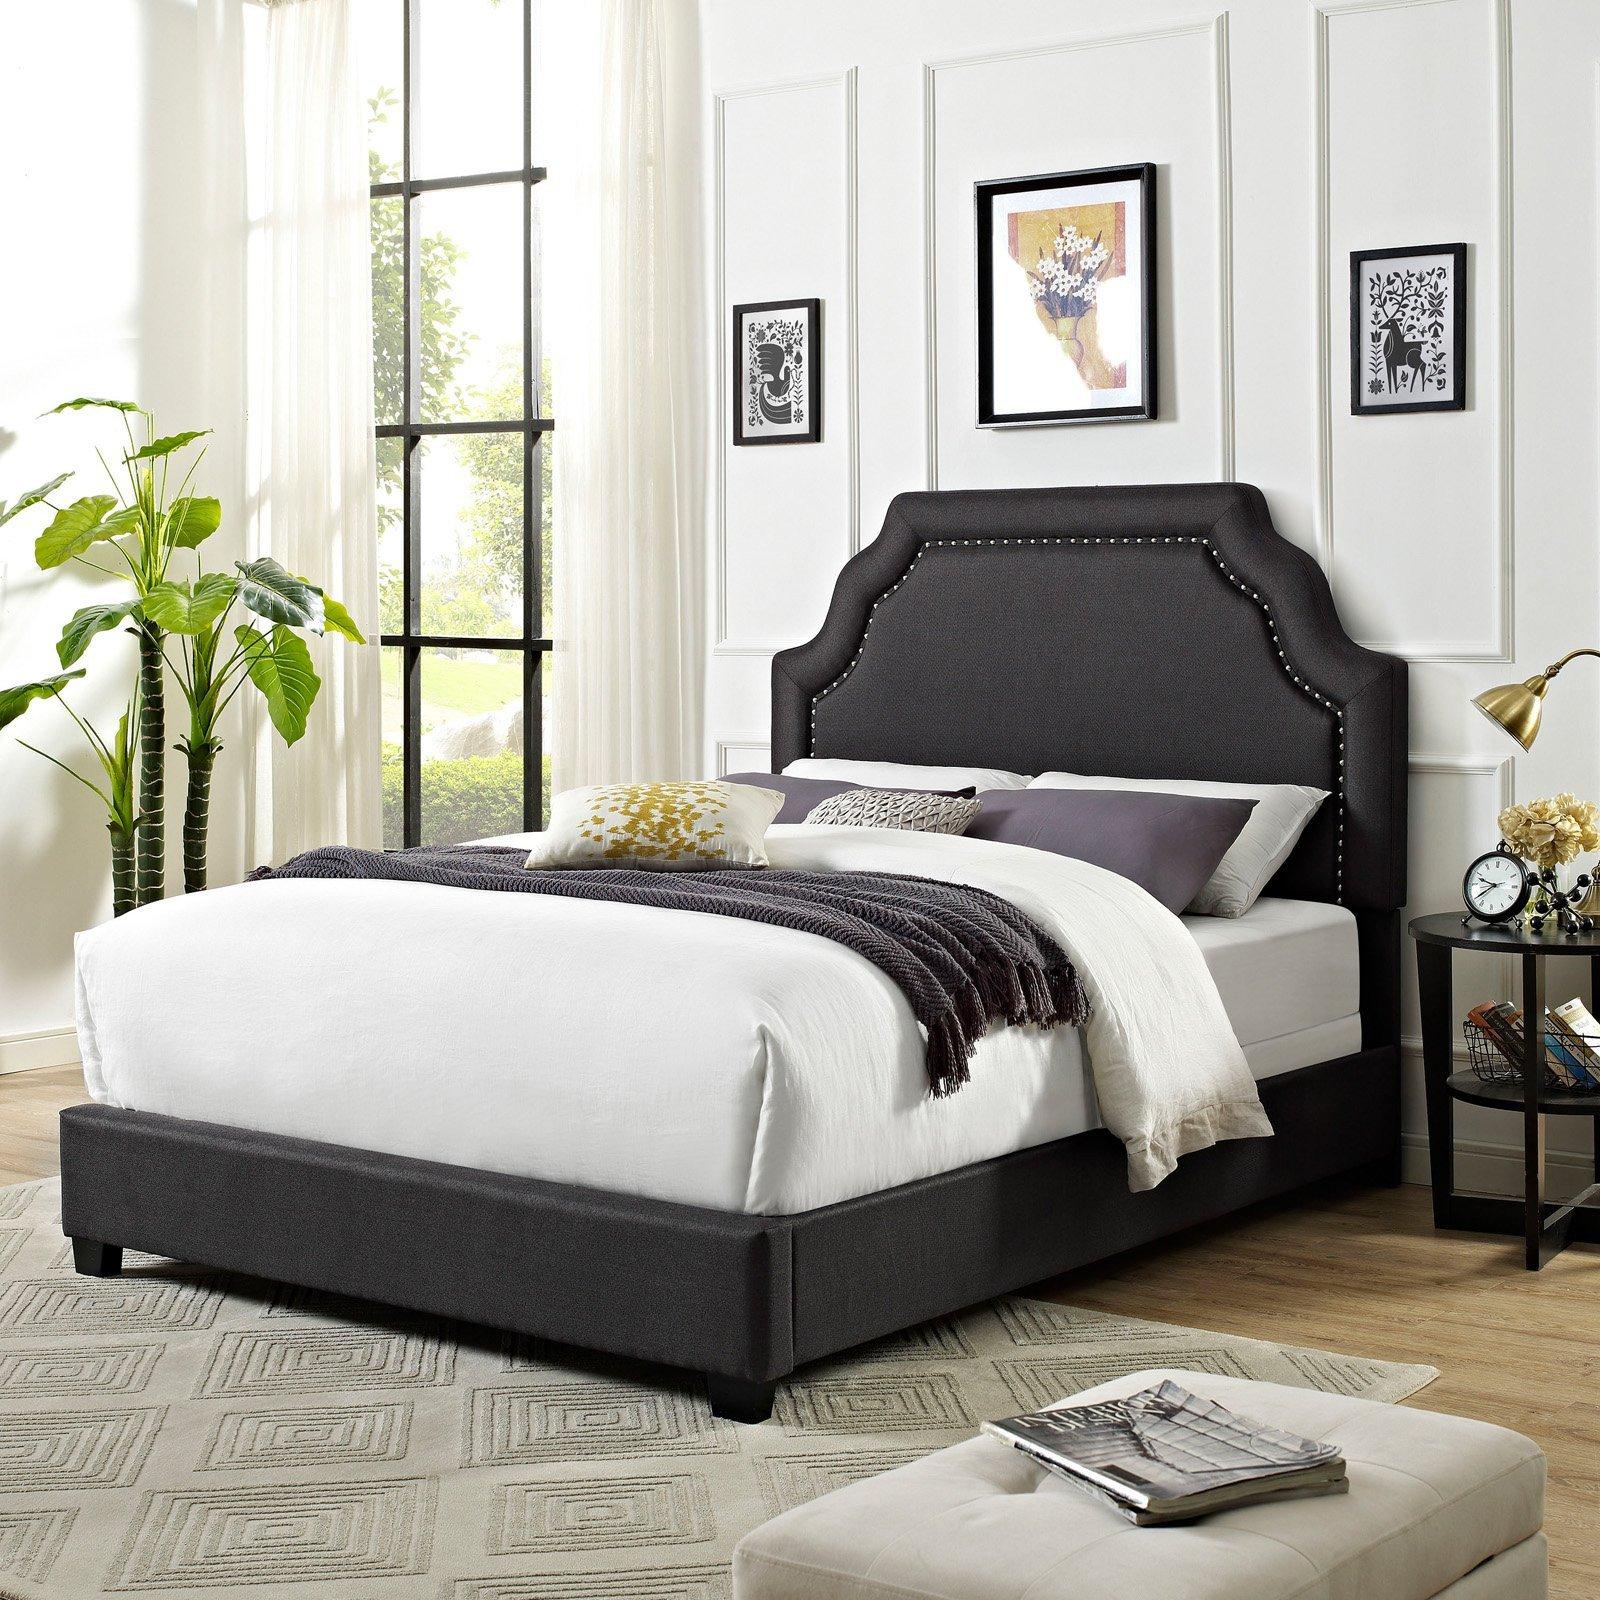 Low Profile Bedroom Set New Crosley Loren Keystone Upholstered Low Profile Bed Charcoal